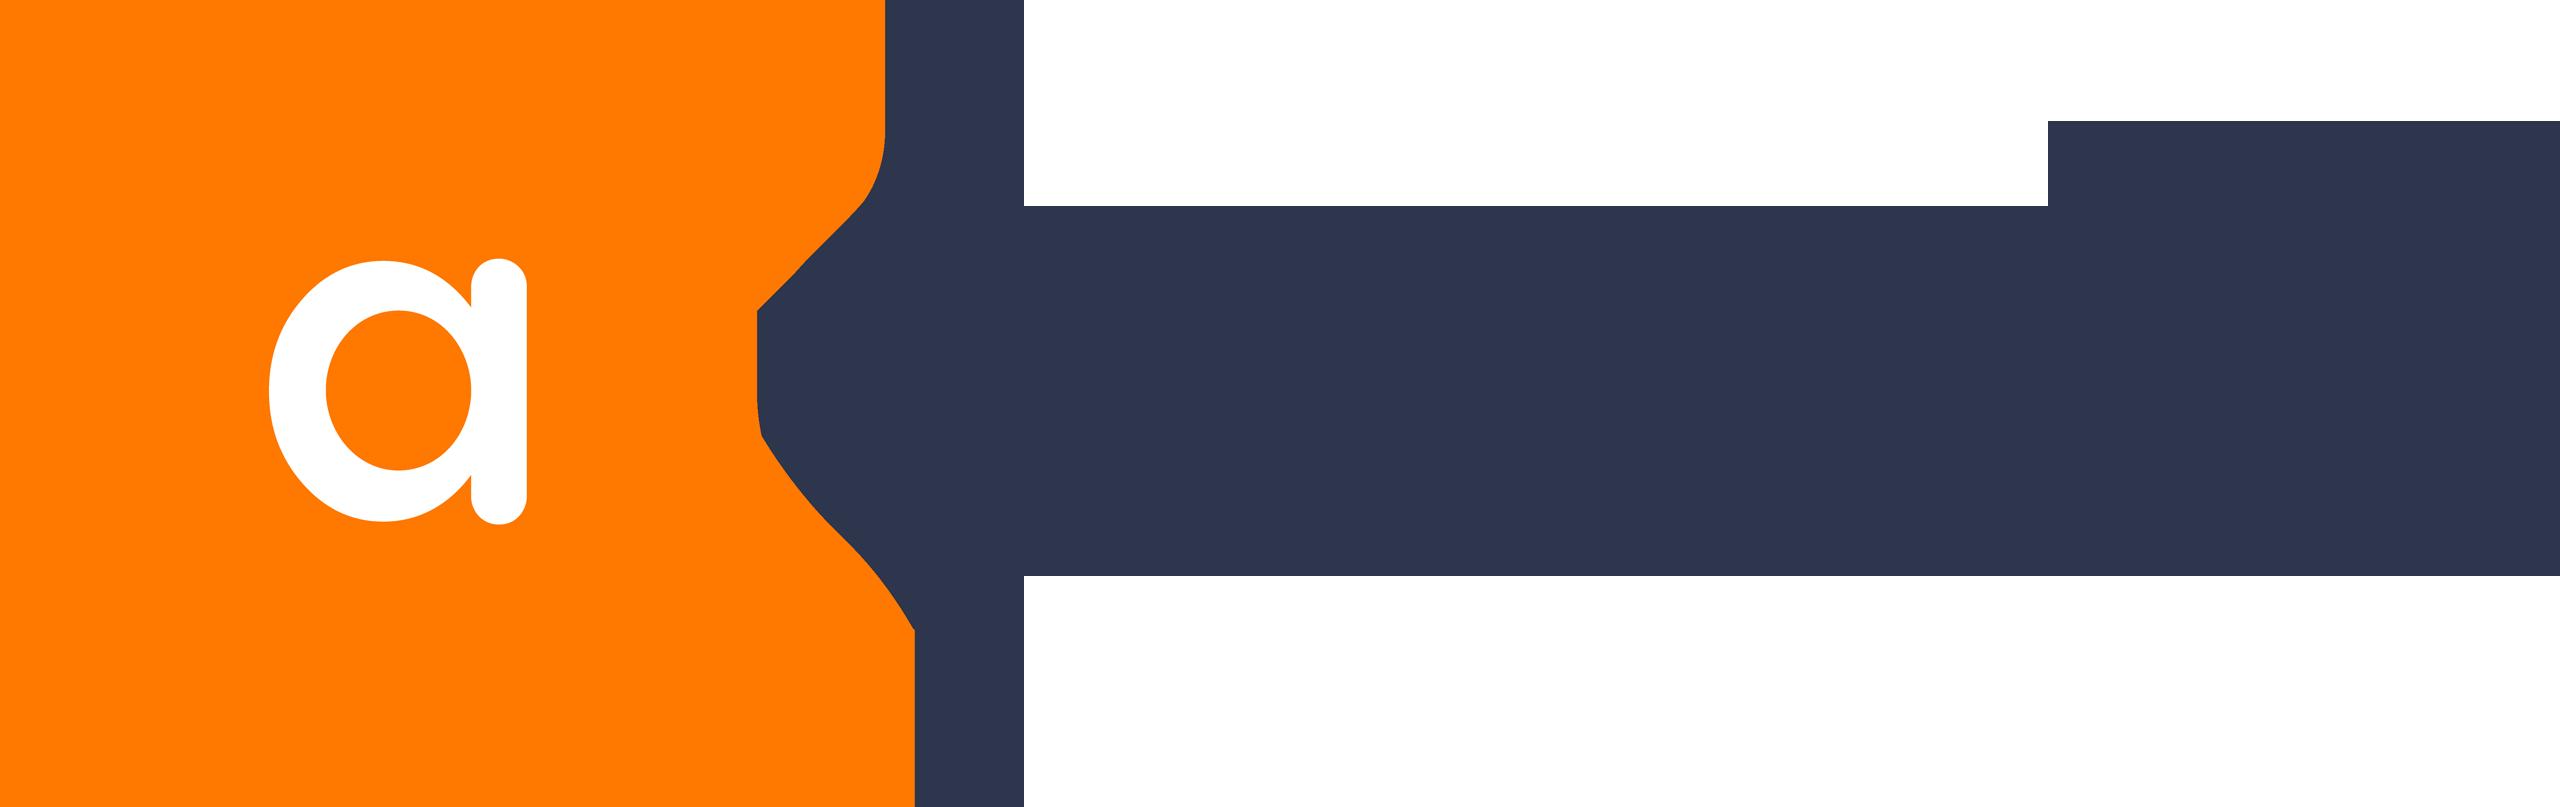 Avast Logo - Avast Vector, Transparent background PNG HD thumbnail